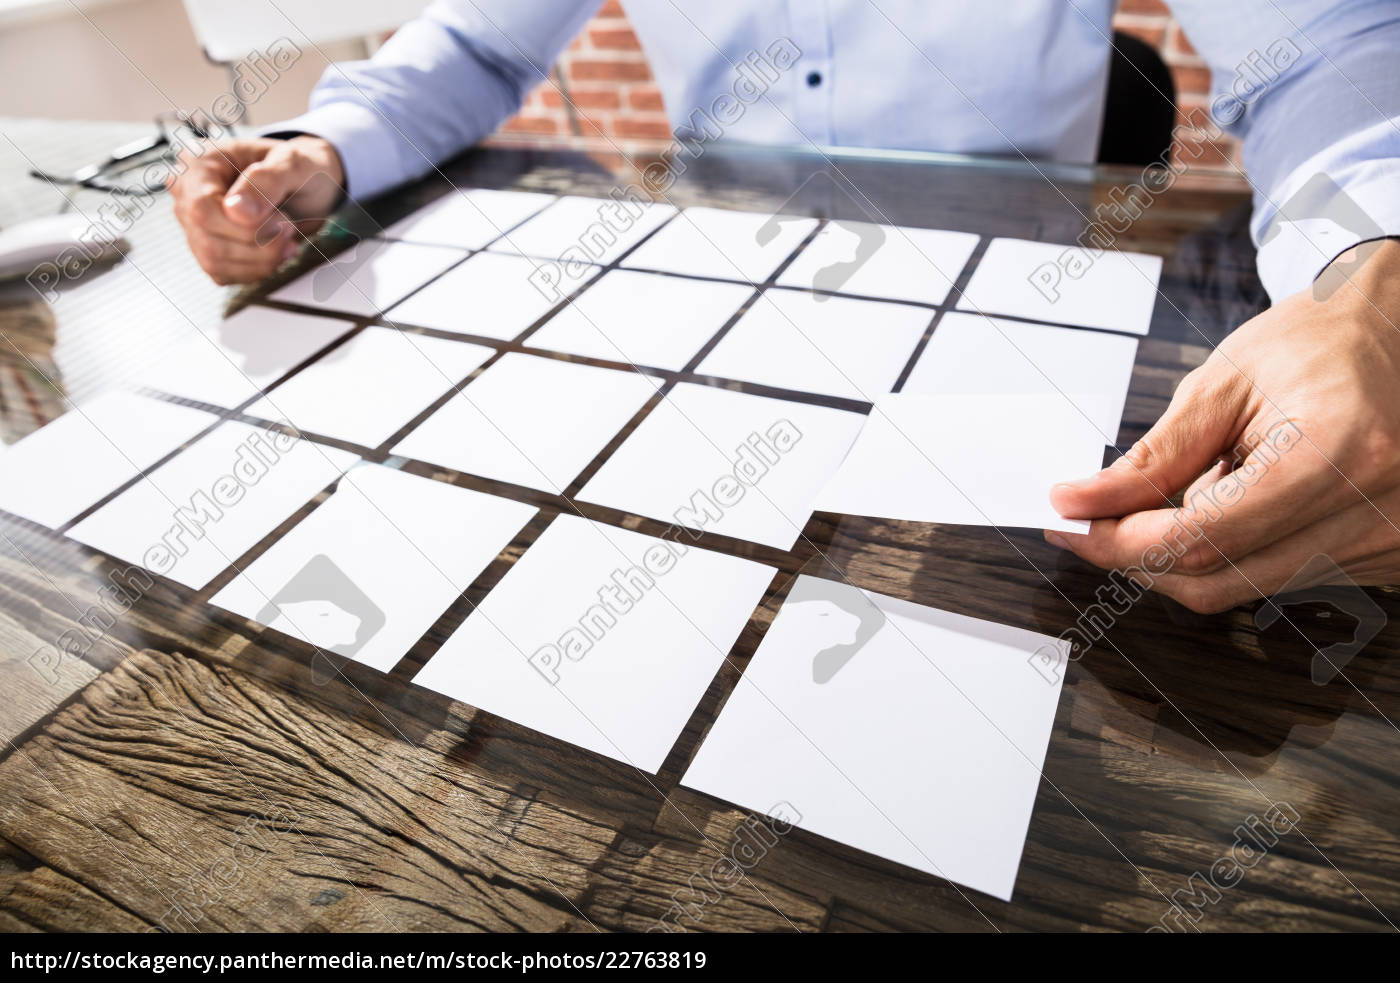 businessman, arranging, adhesive, notes, on, desk - 22763819